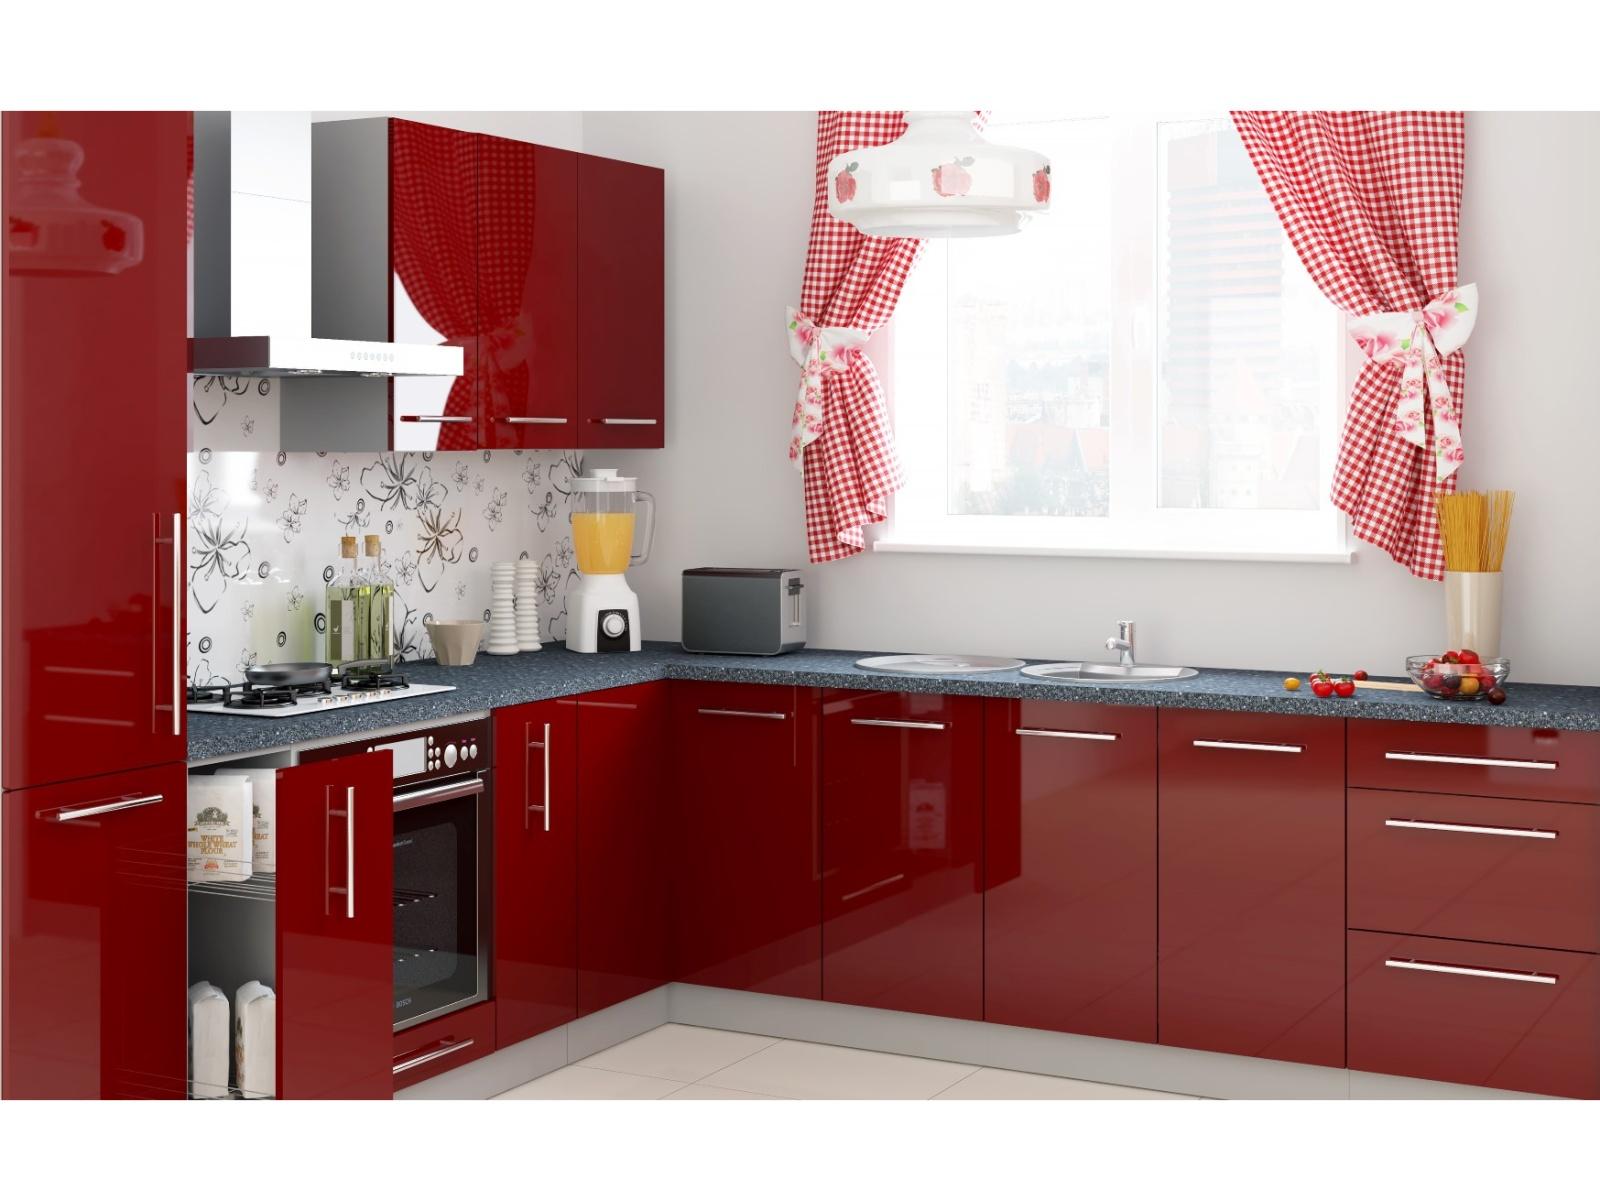 Extom Rohová kuchyně PLATINUM 130/400 cm, VZOROVÁ SESTAVA, deep red